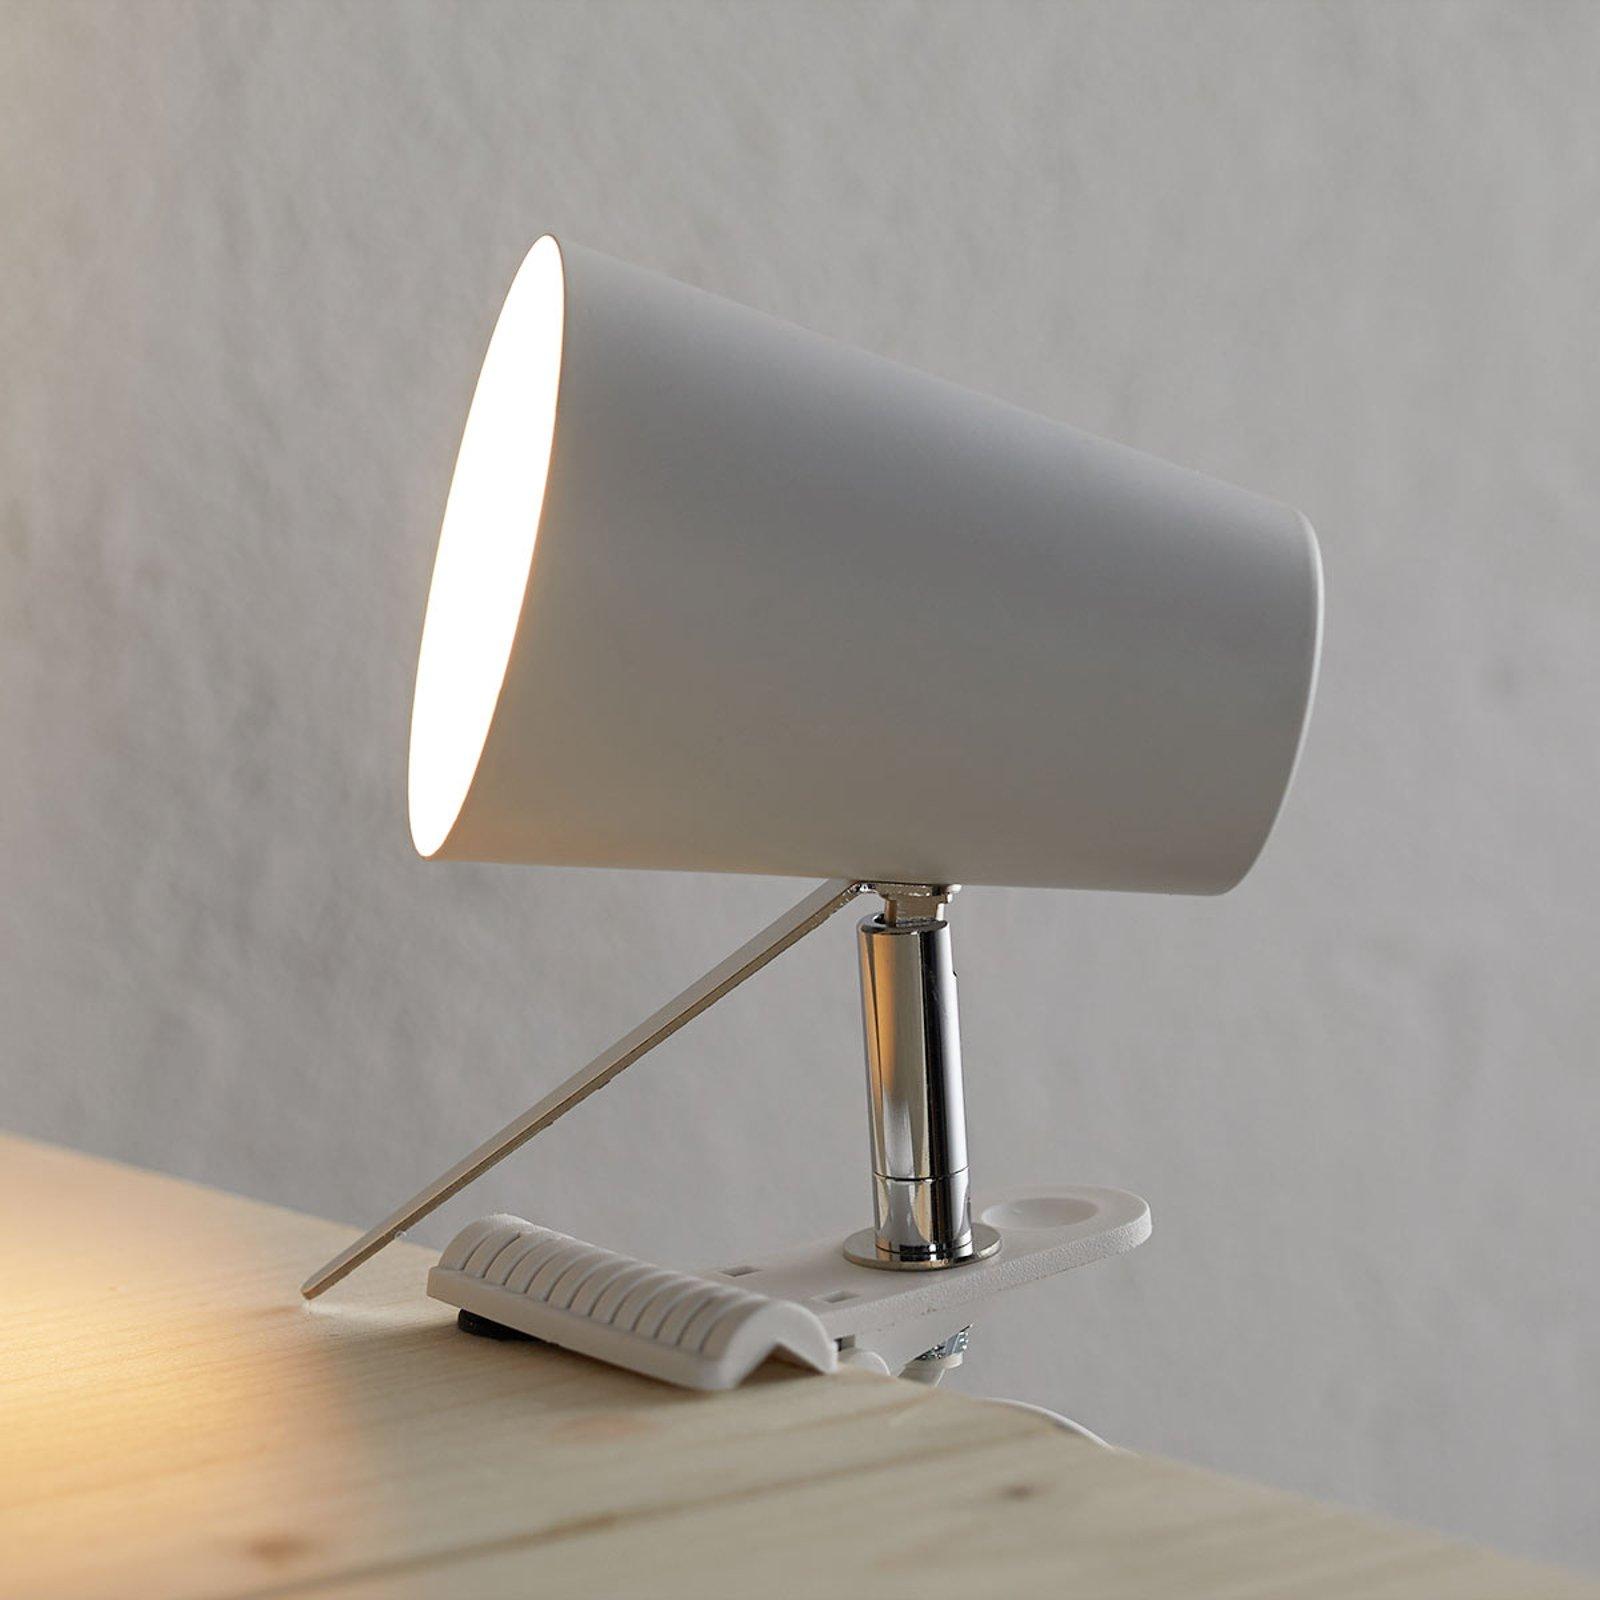 Hvit klemmelampe Clampspots i moderne stil